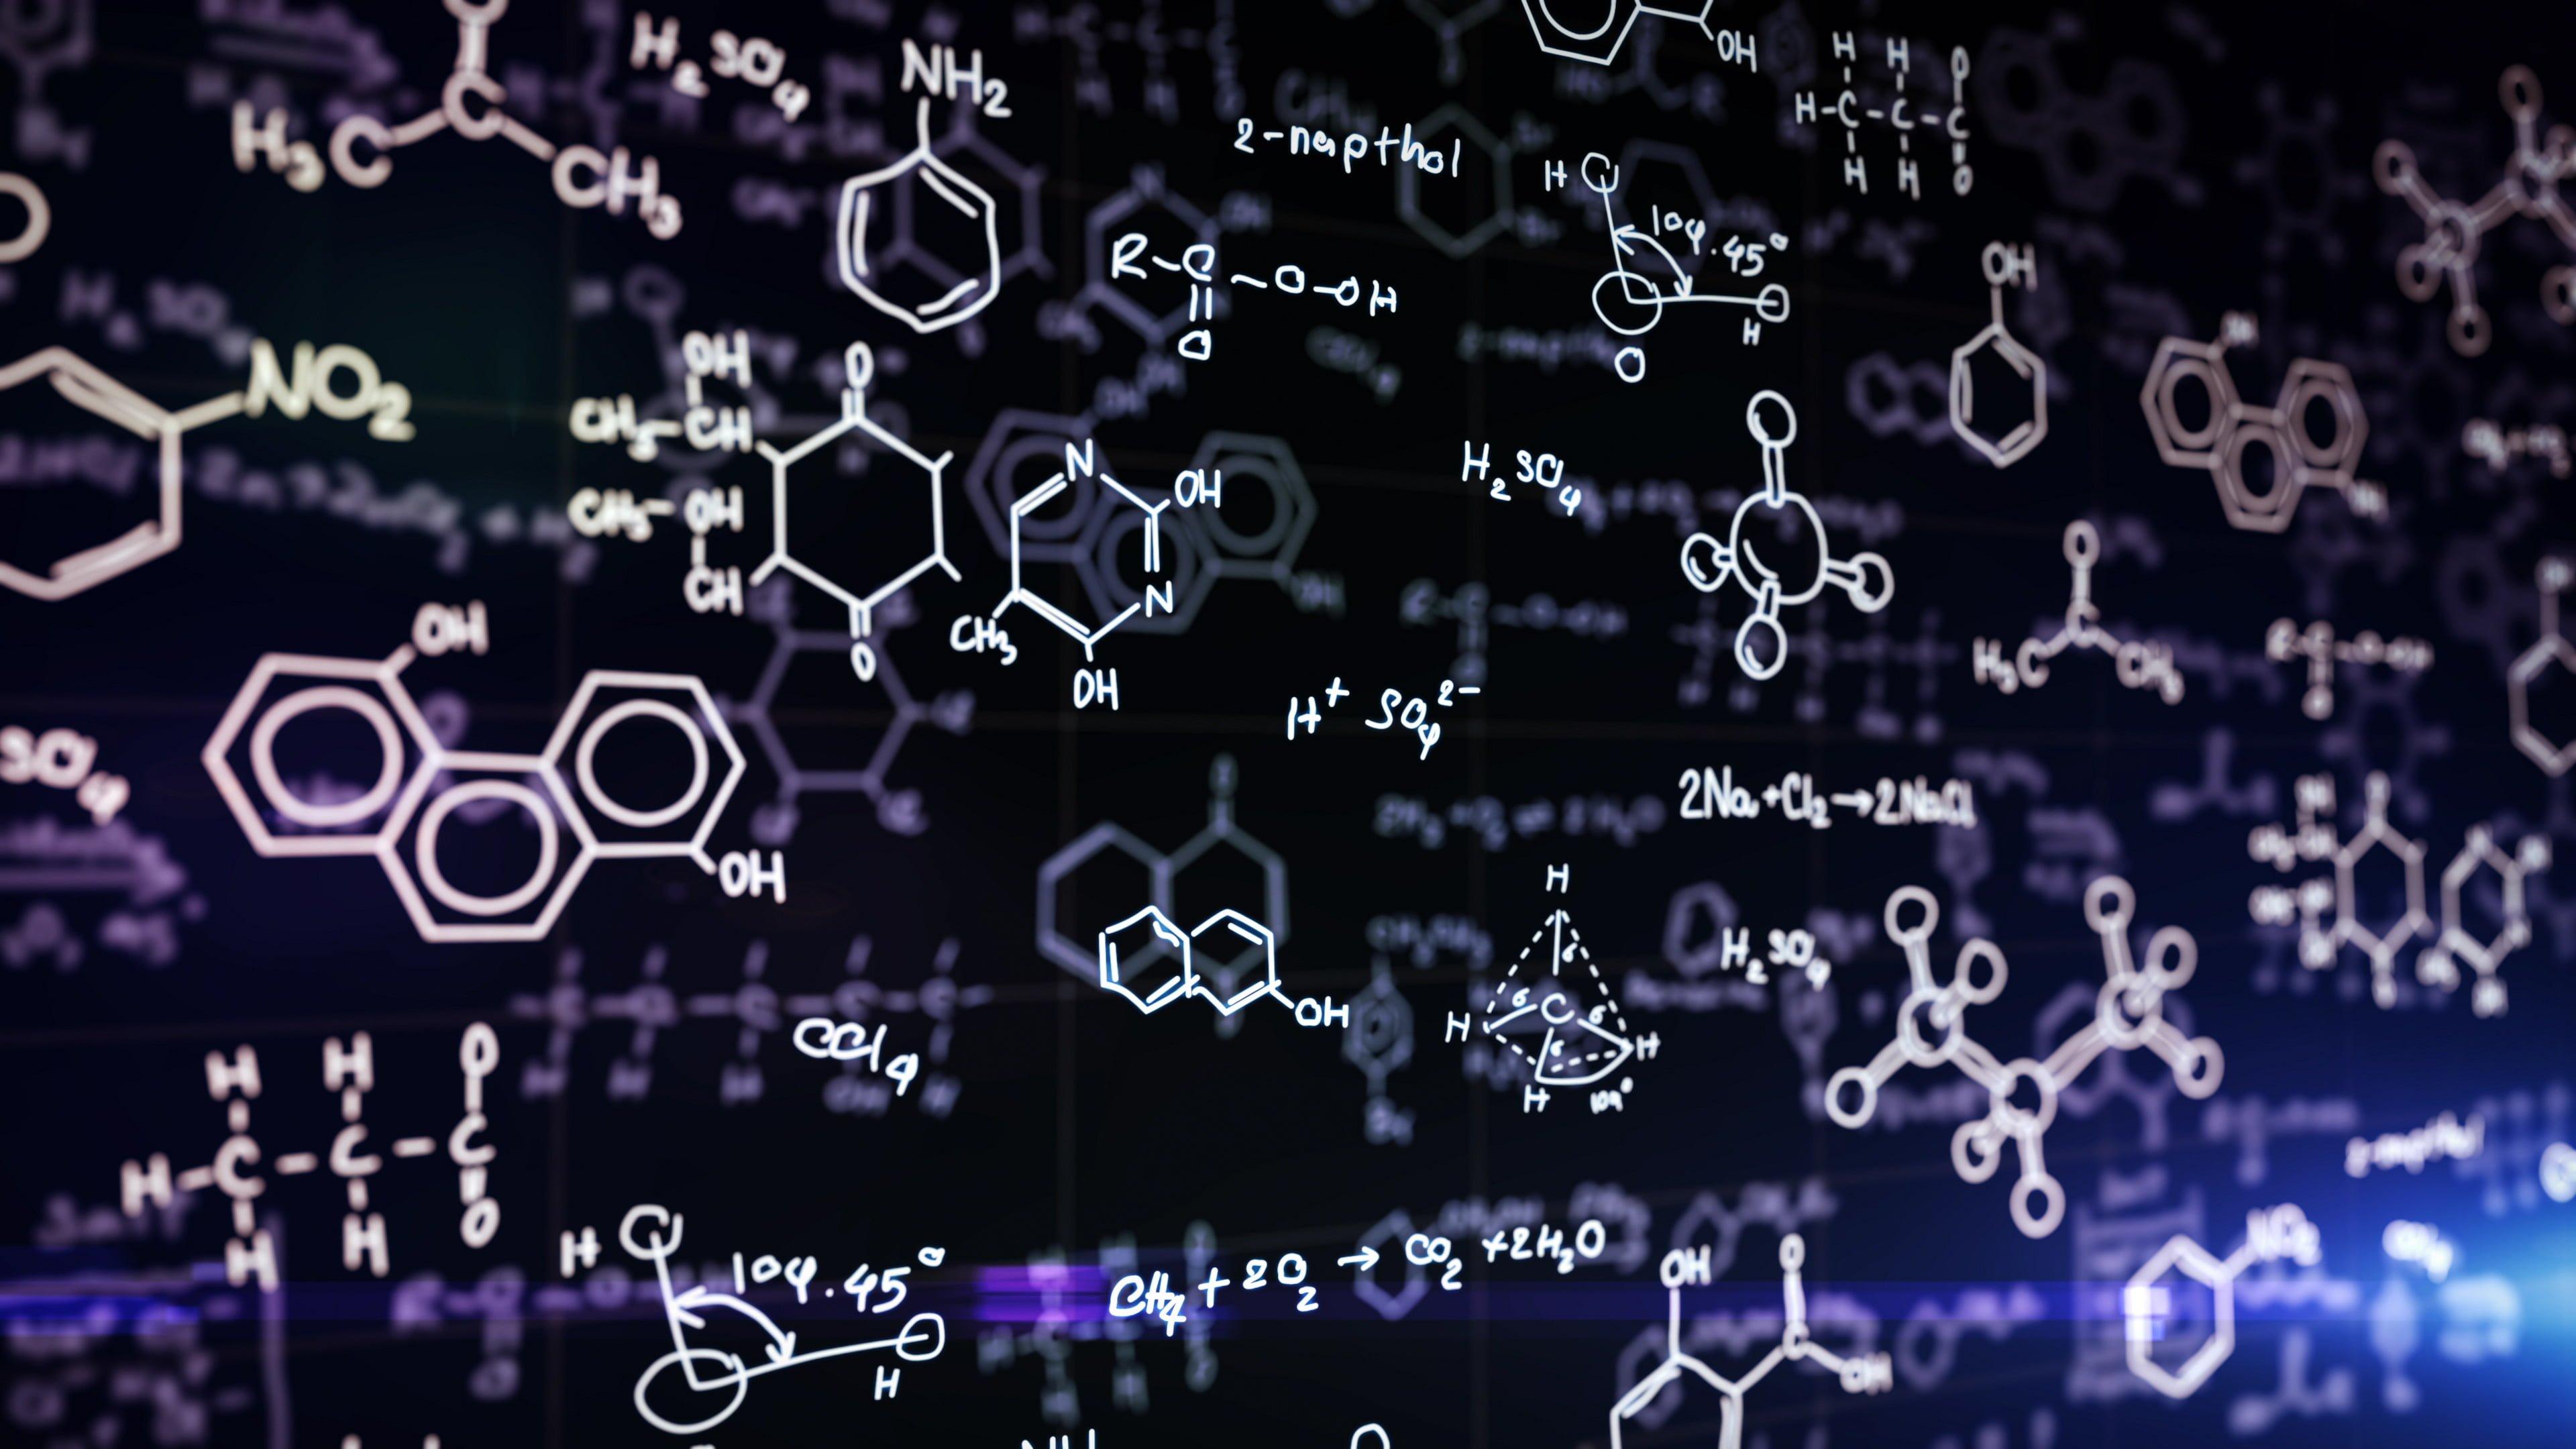 chemia organiczna zadania maturalne